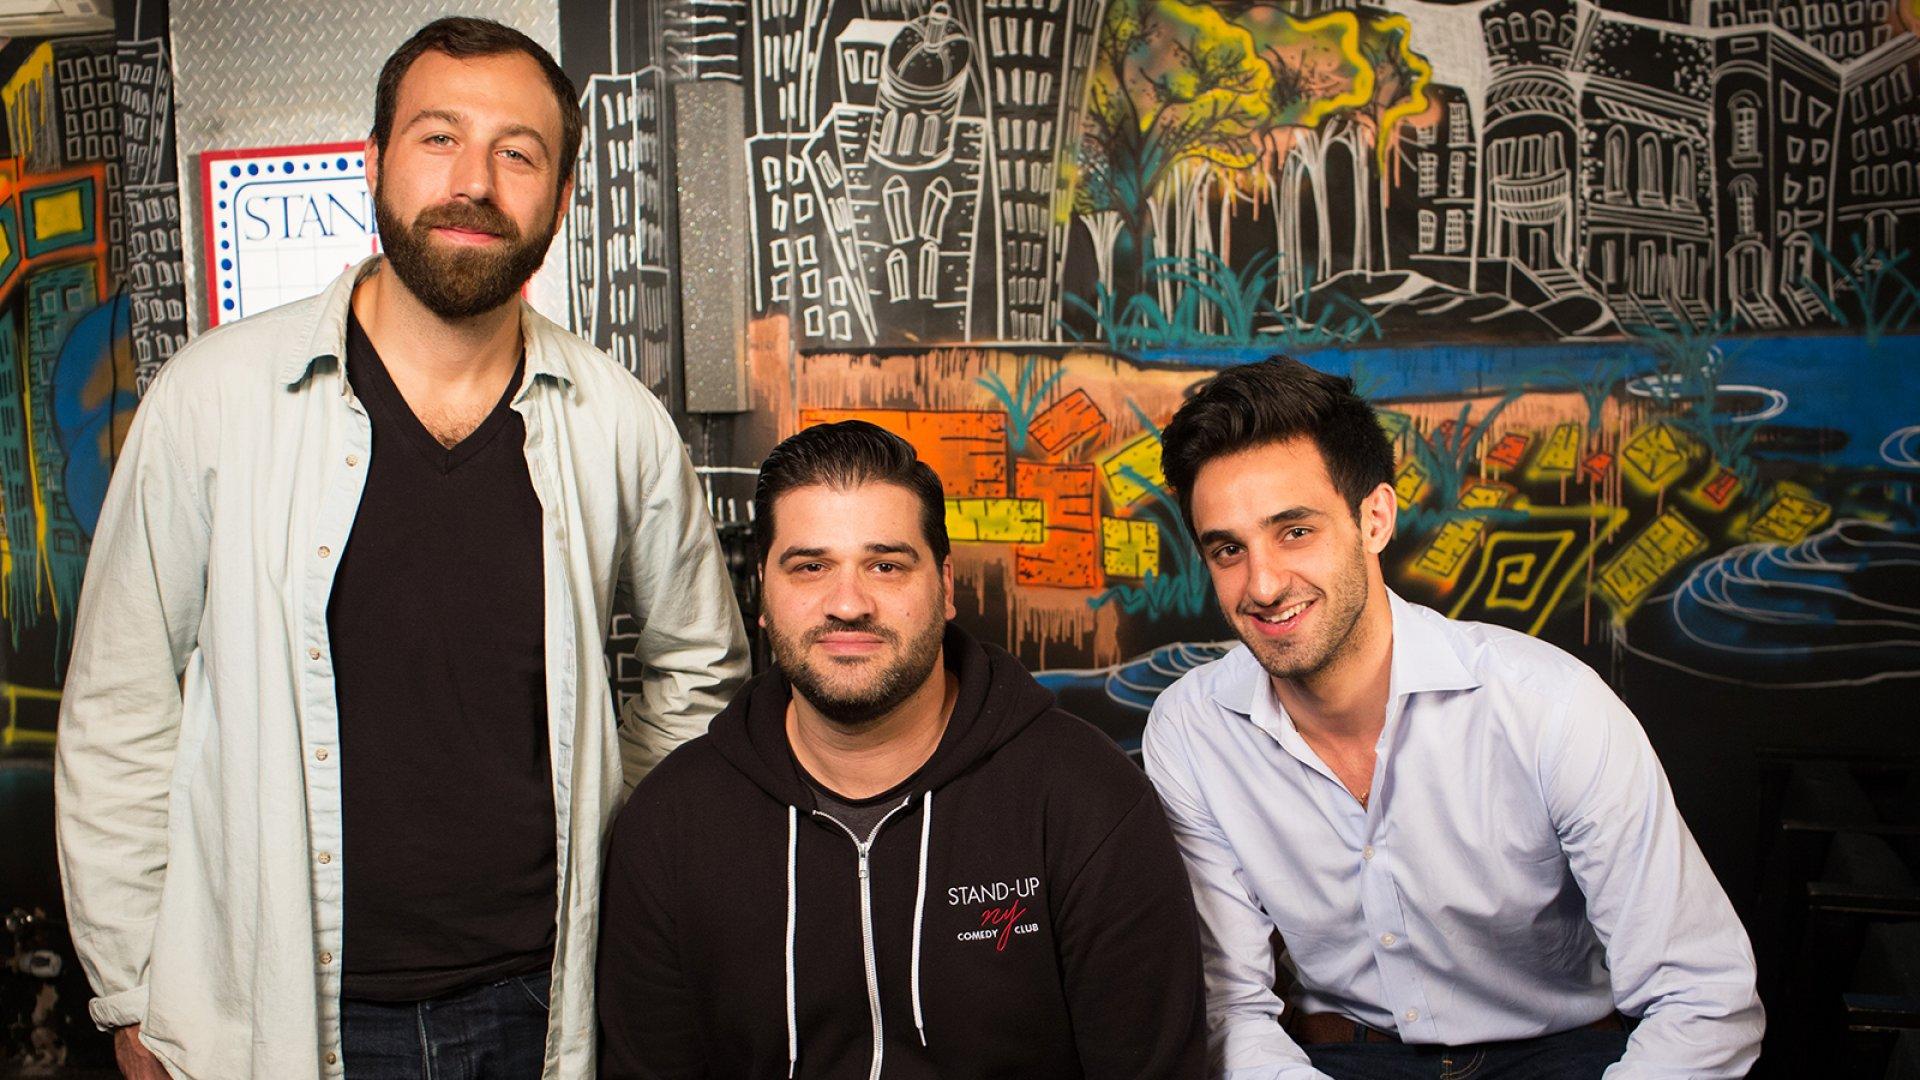 Founders of Skitish Media Jonathan Fatigate (left), Dani Zoldan, and Judah Meiteles.